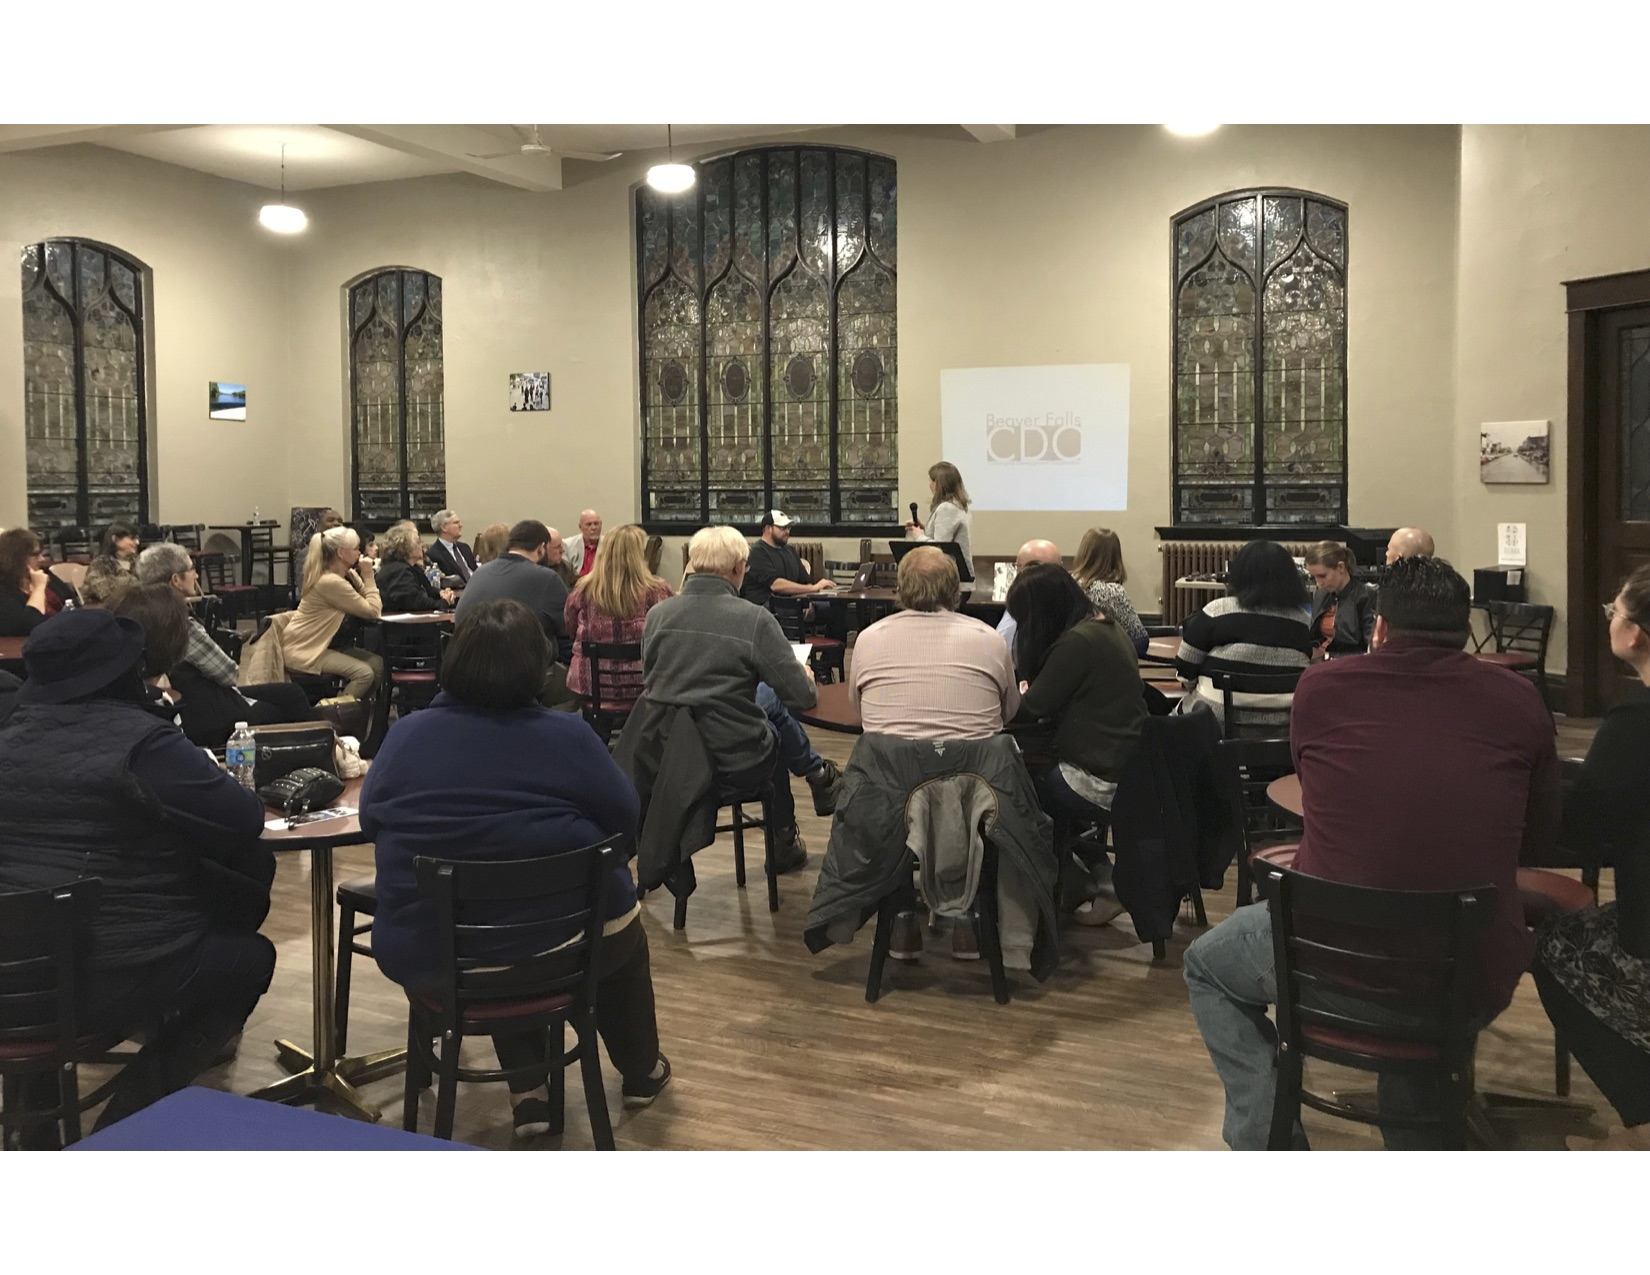 More than 3 R's: Practicing Community Development in Beaver Fallsby Wendy Van Wyhe -